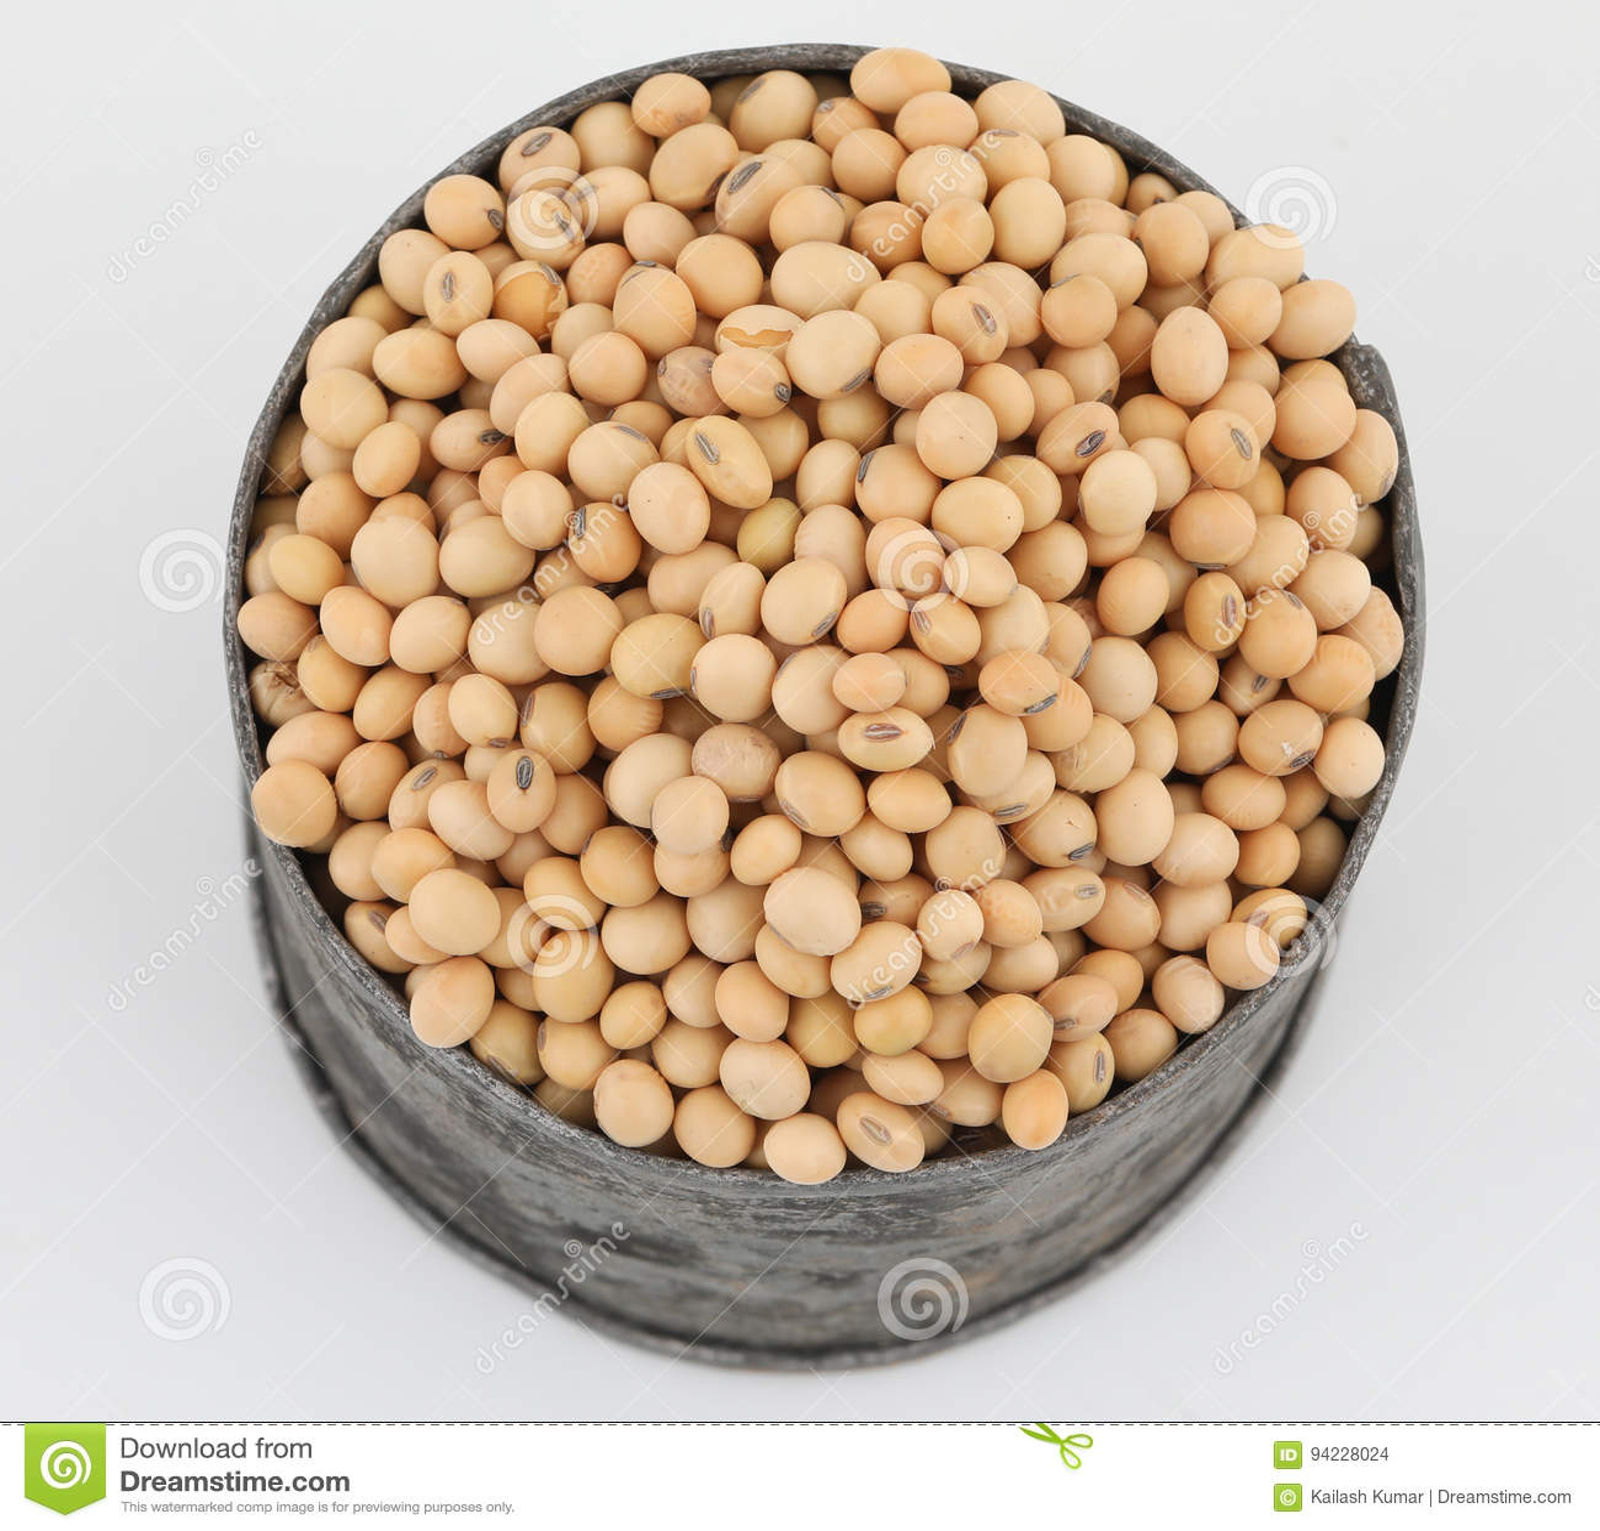 Black Eyed Peas Nutrition - NutritionWalls